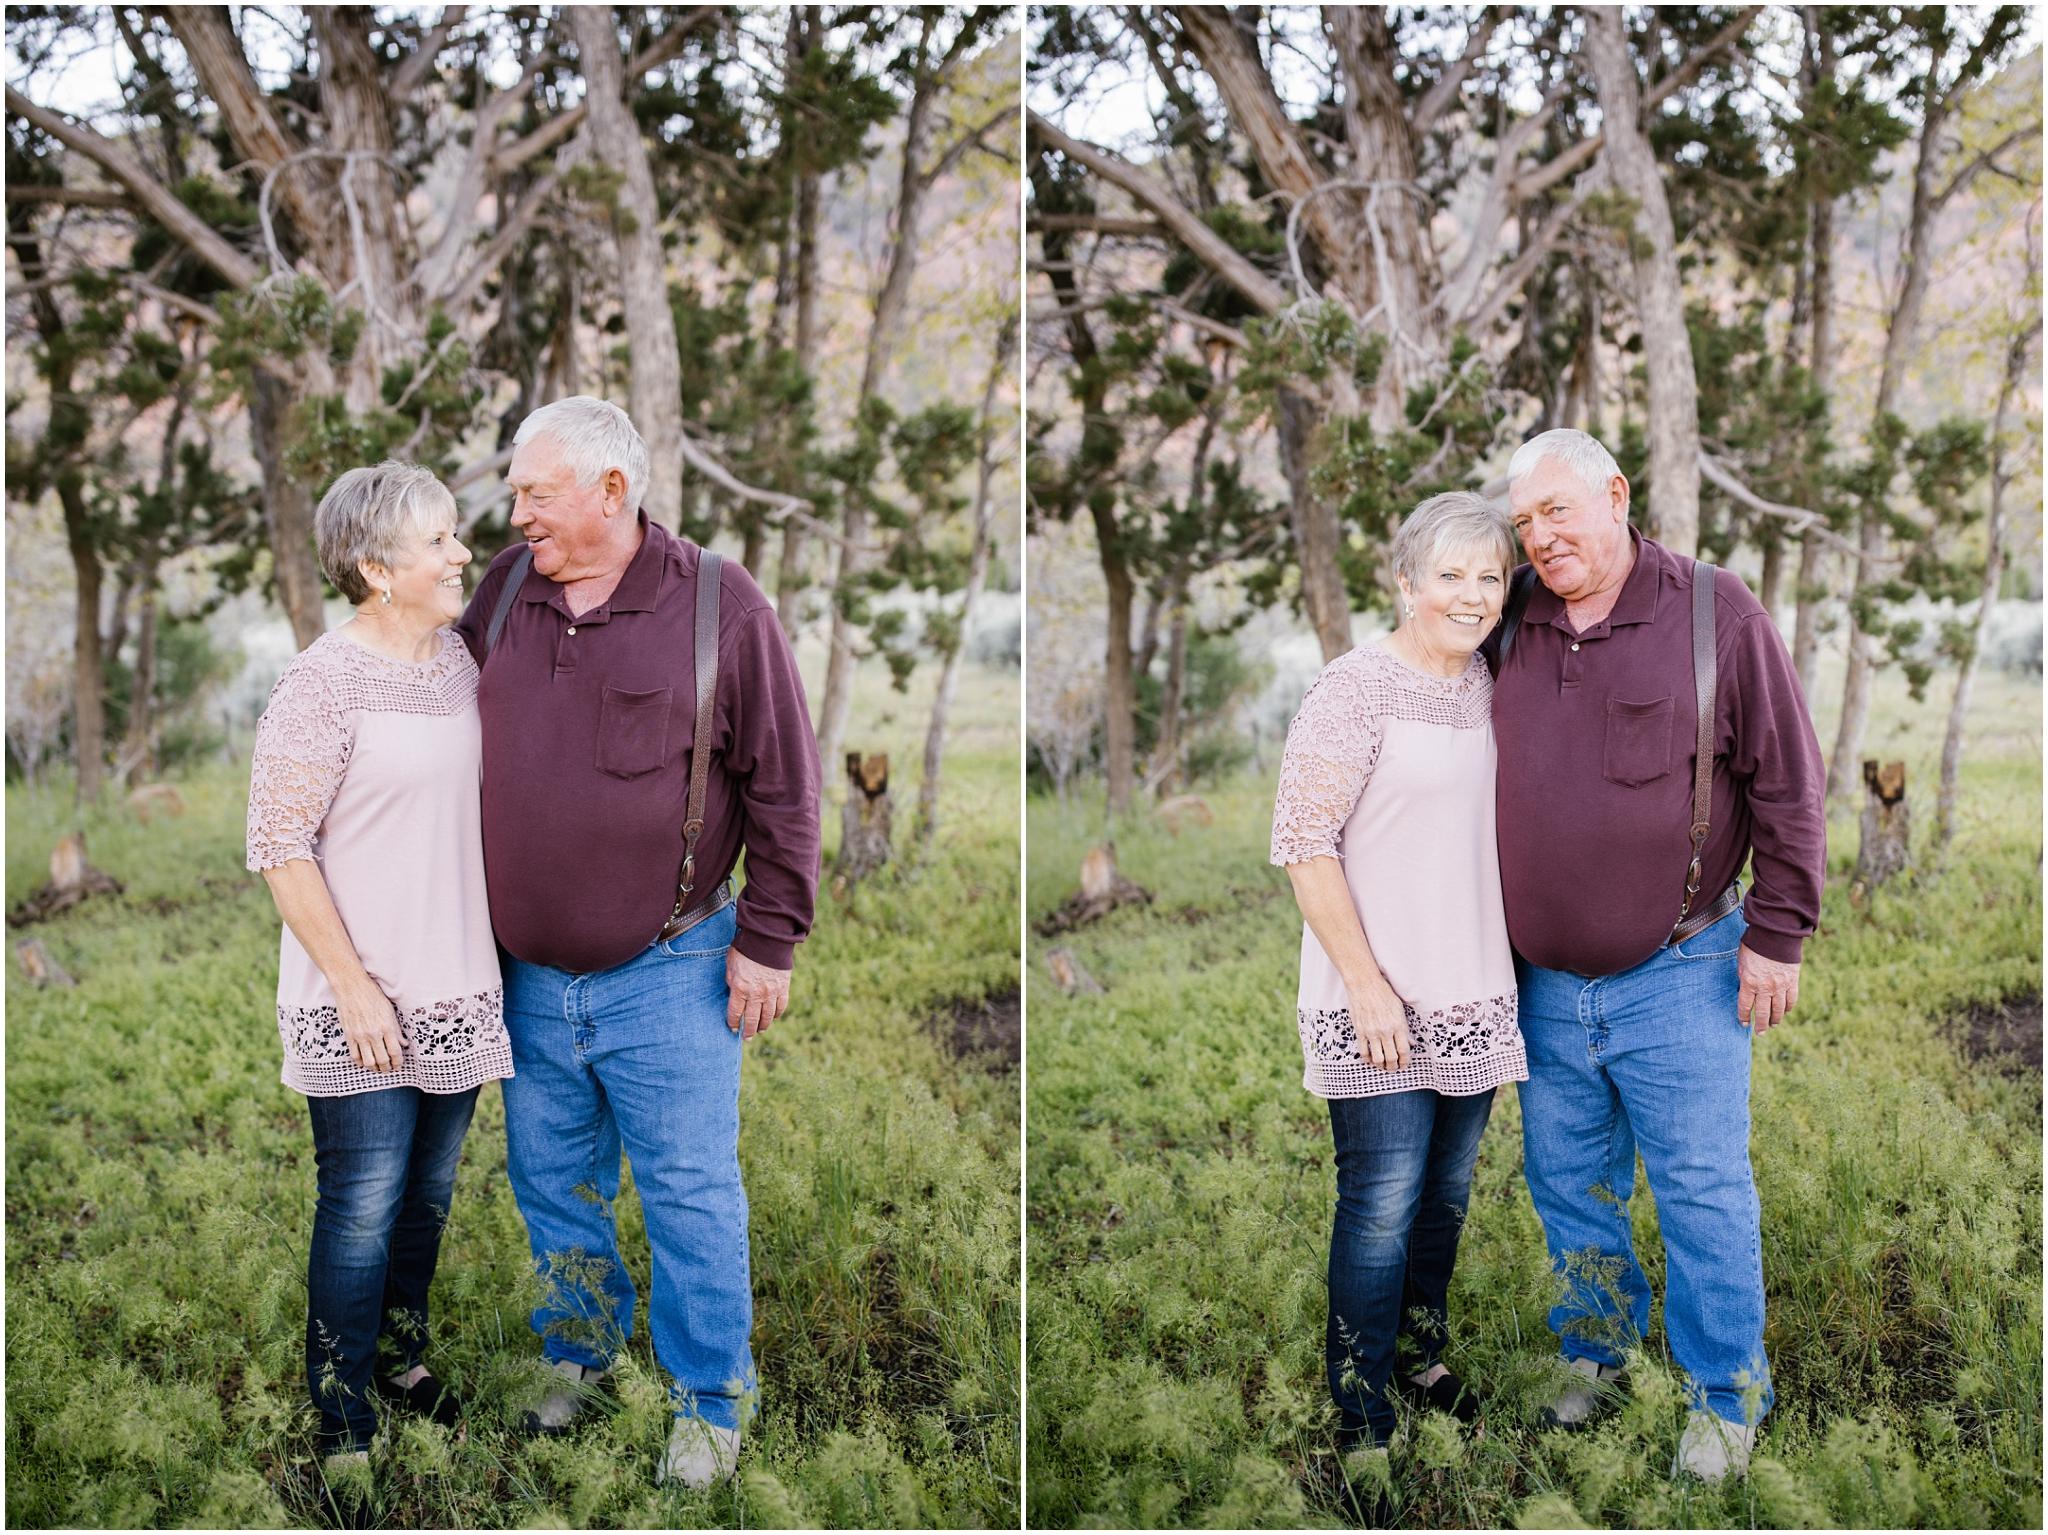 Bagley-28_Lizzie-B-Imagery-Utah-Family-Photographer-Central-Utah-Photographer-Utah-County-Extended-Family.jpg